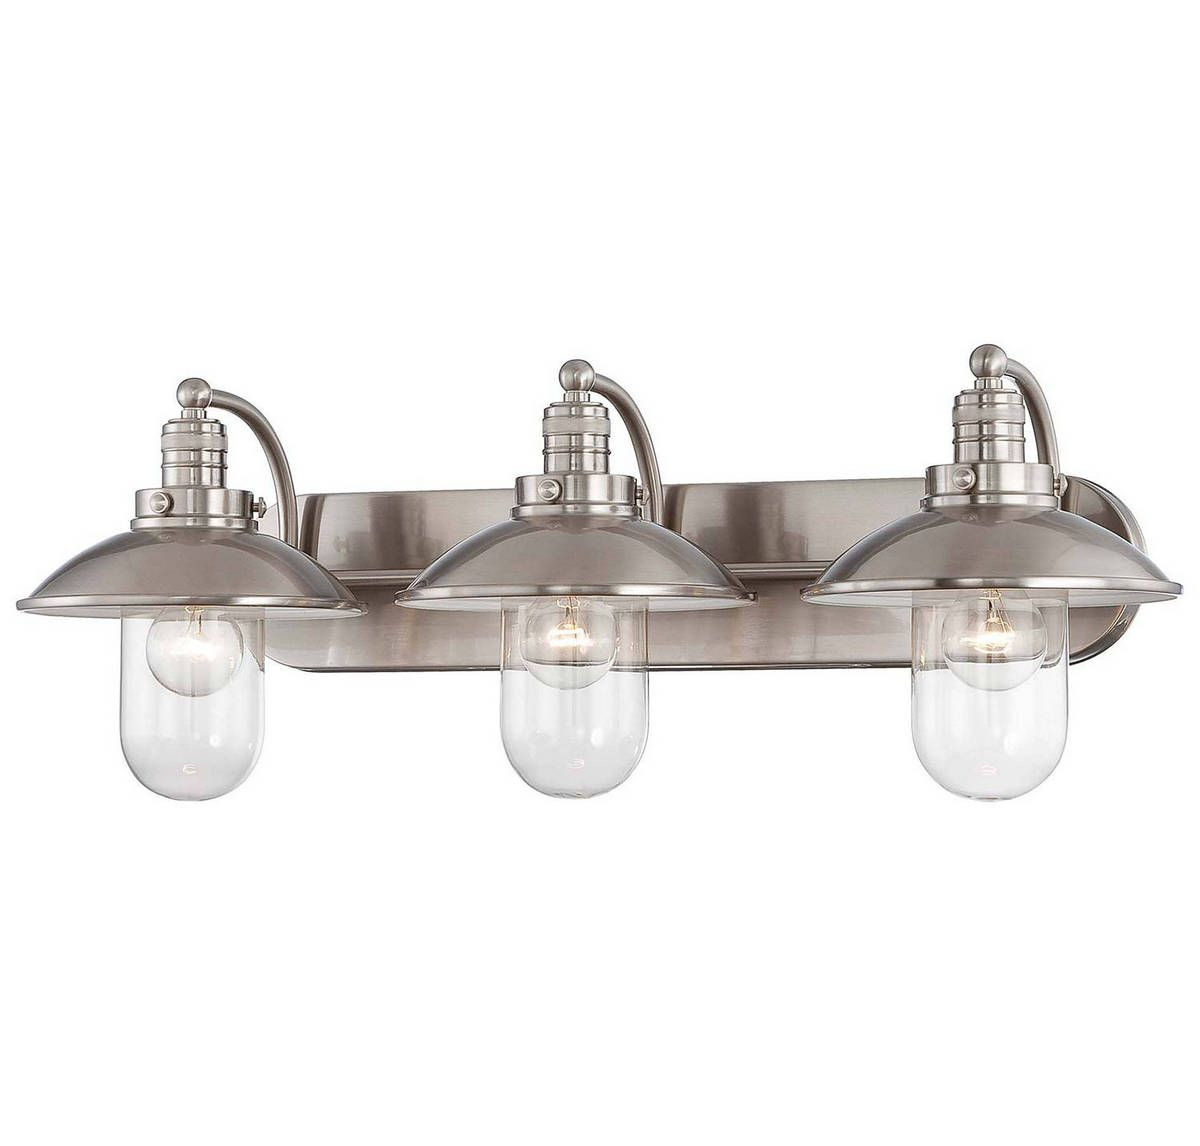 Minka Lavery Downtown Edison 3 Light 29 Bathroom Vanity Light In Brushed Nickel